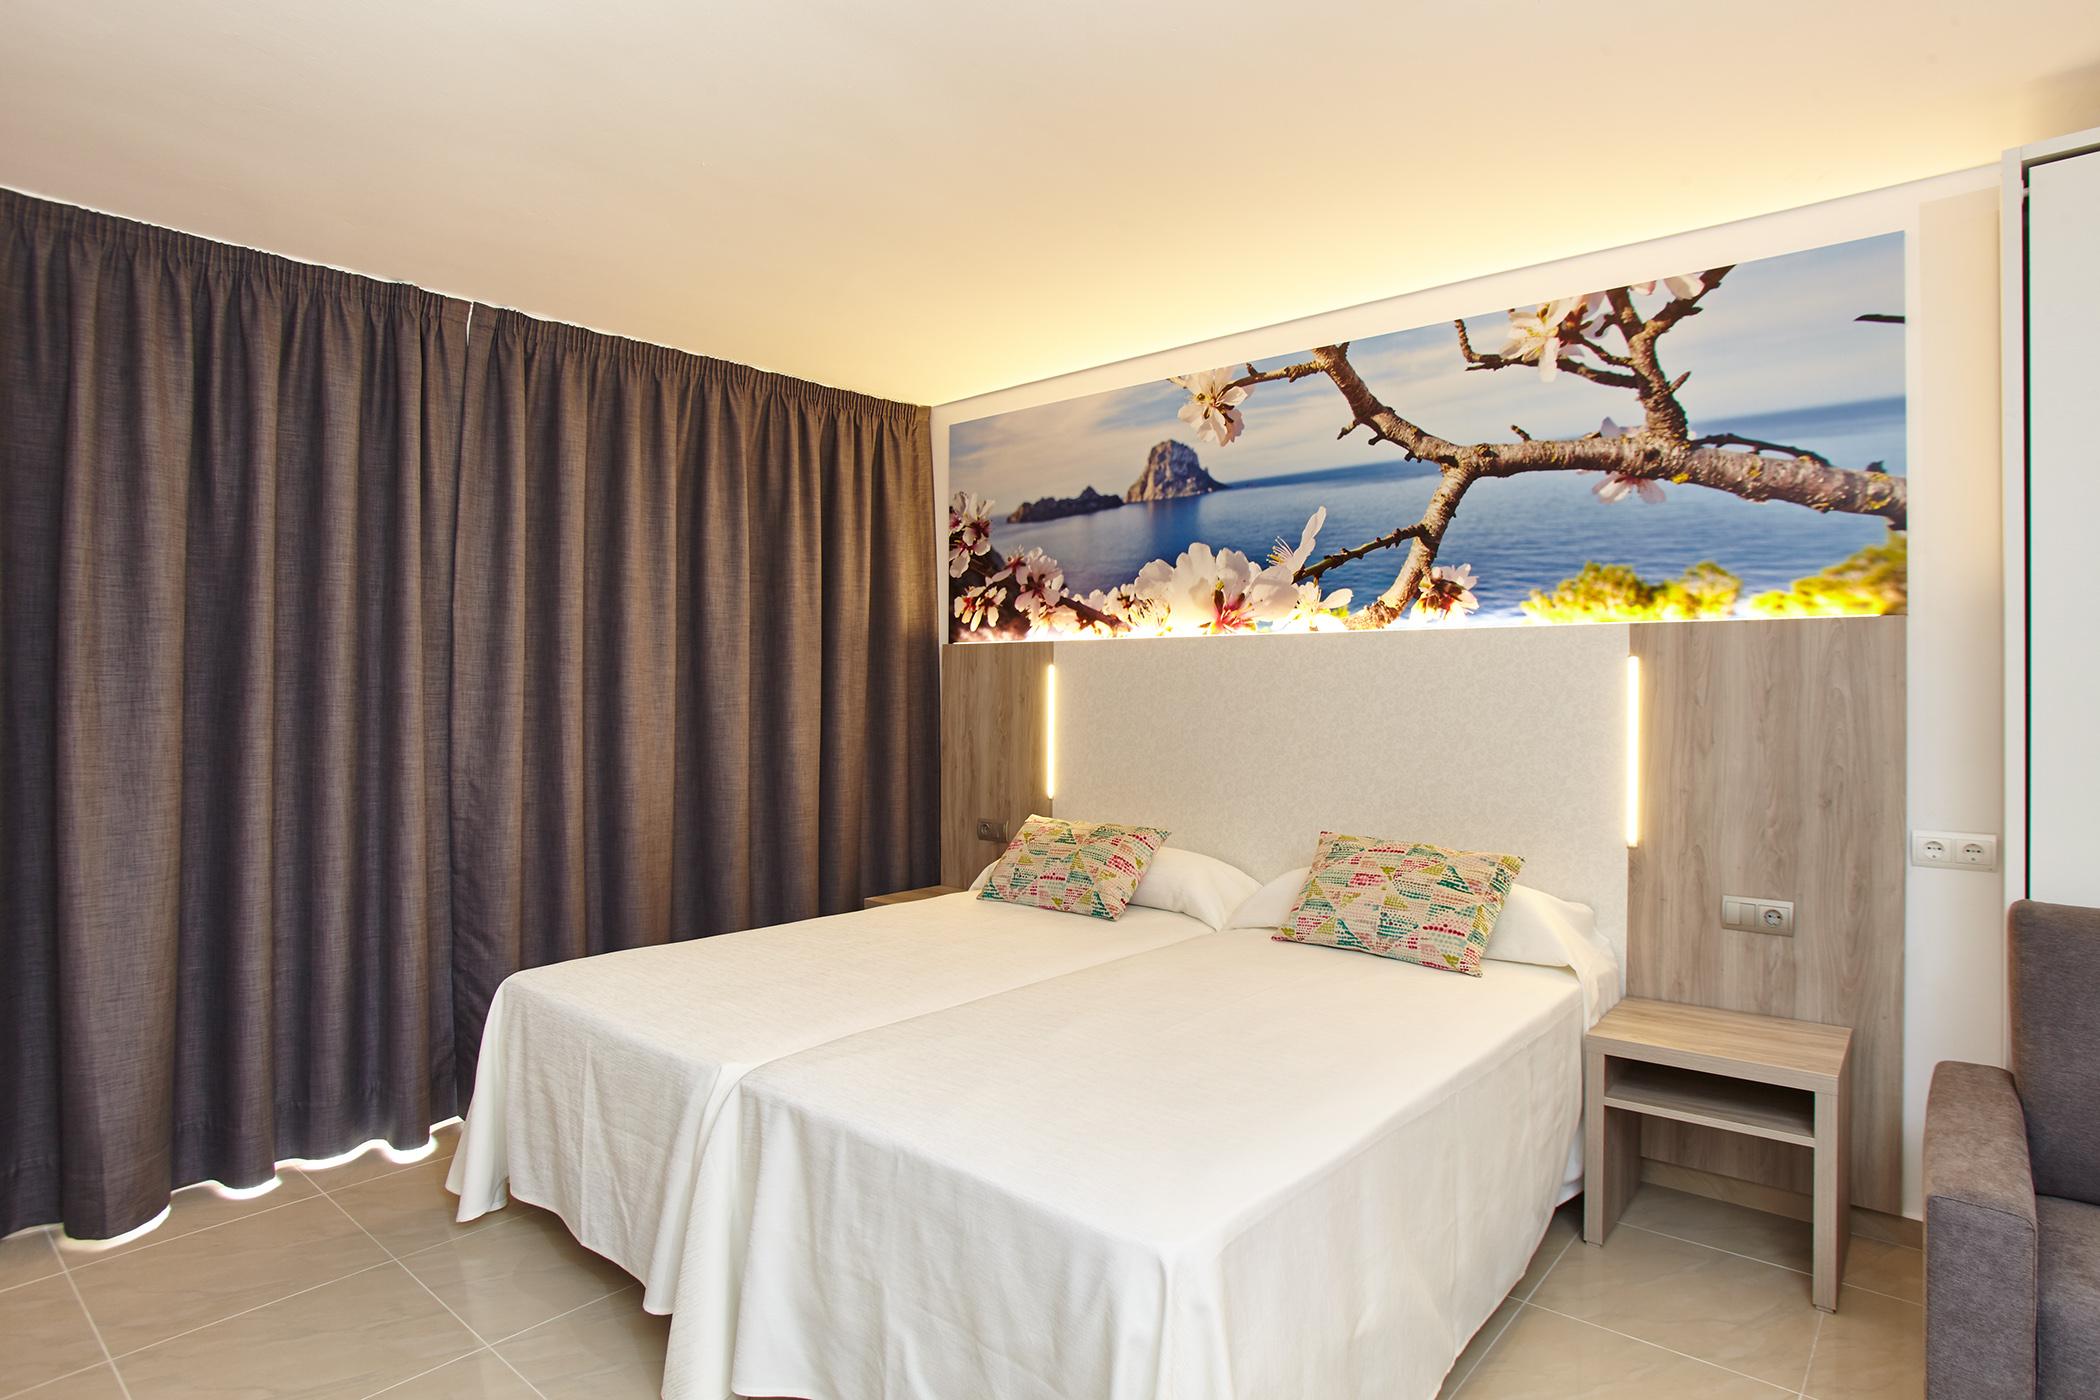 Billige Unterkunft in San Antonio, IbizaApartments San Antonio town, Ibiza. Mar i Vent Apartments Sibiza Group